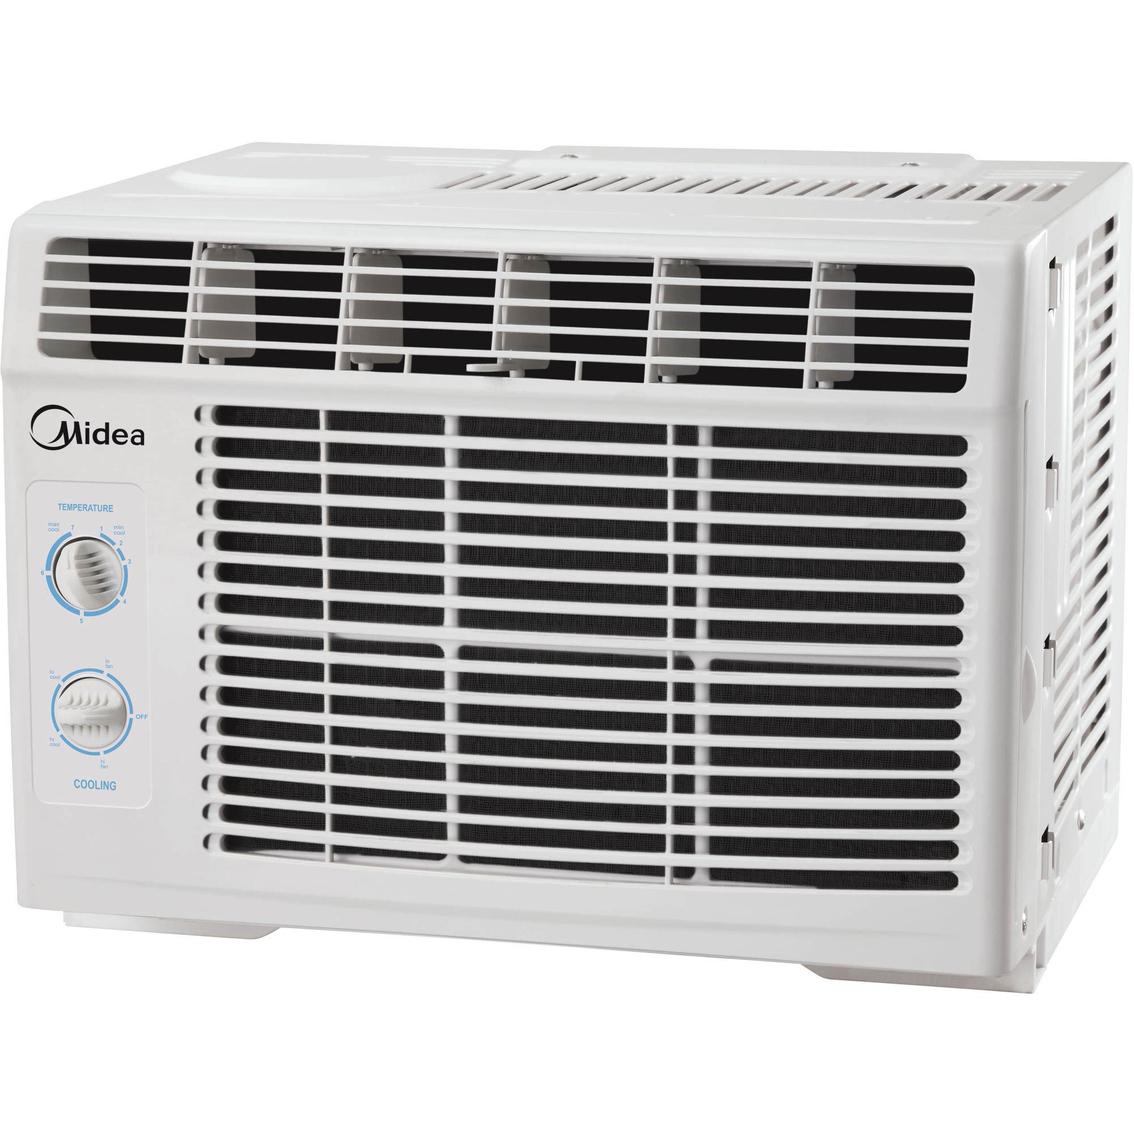 Midea 5 000 Btu Window Air Conditioner Conditioners Home Appliances The Exchange